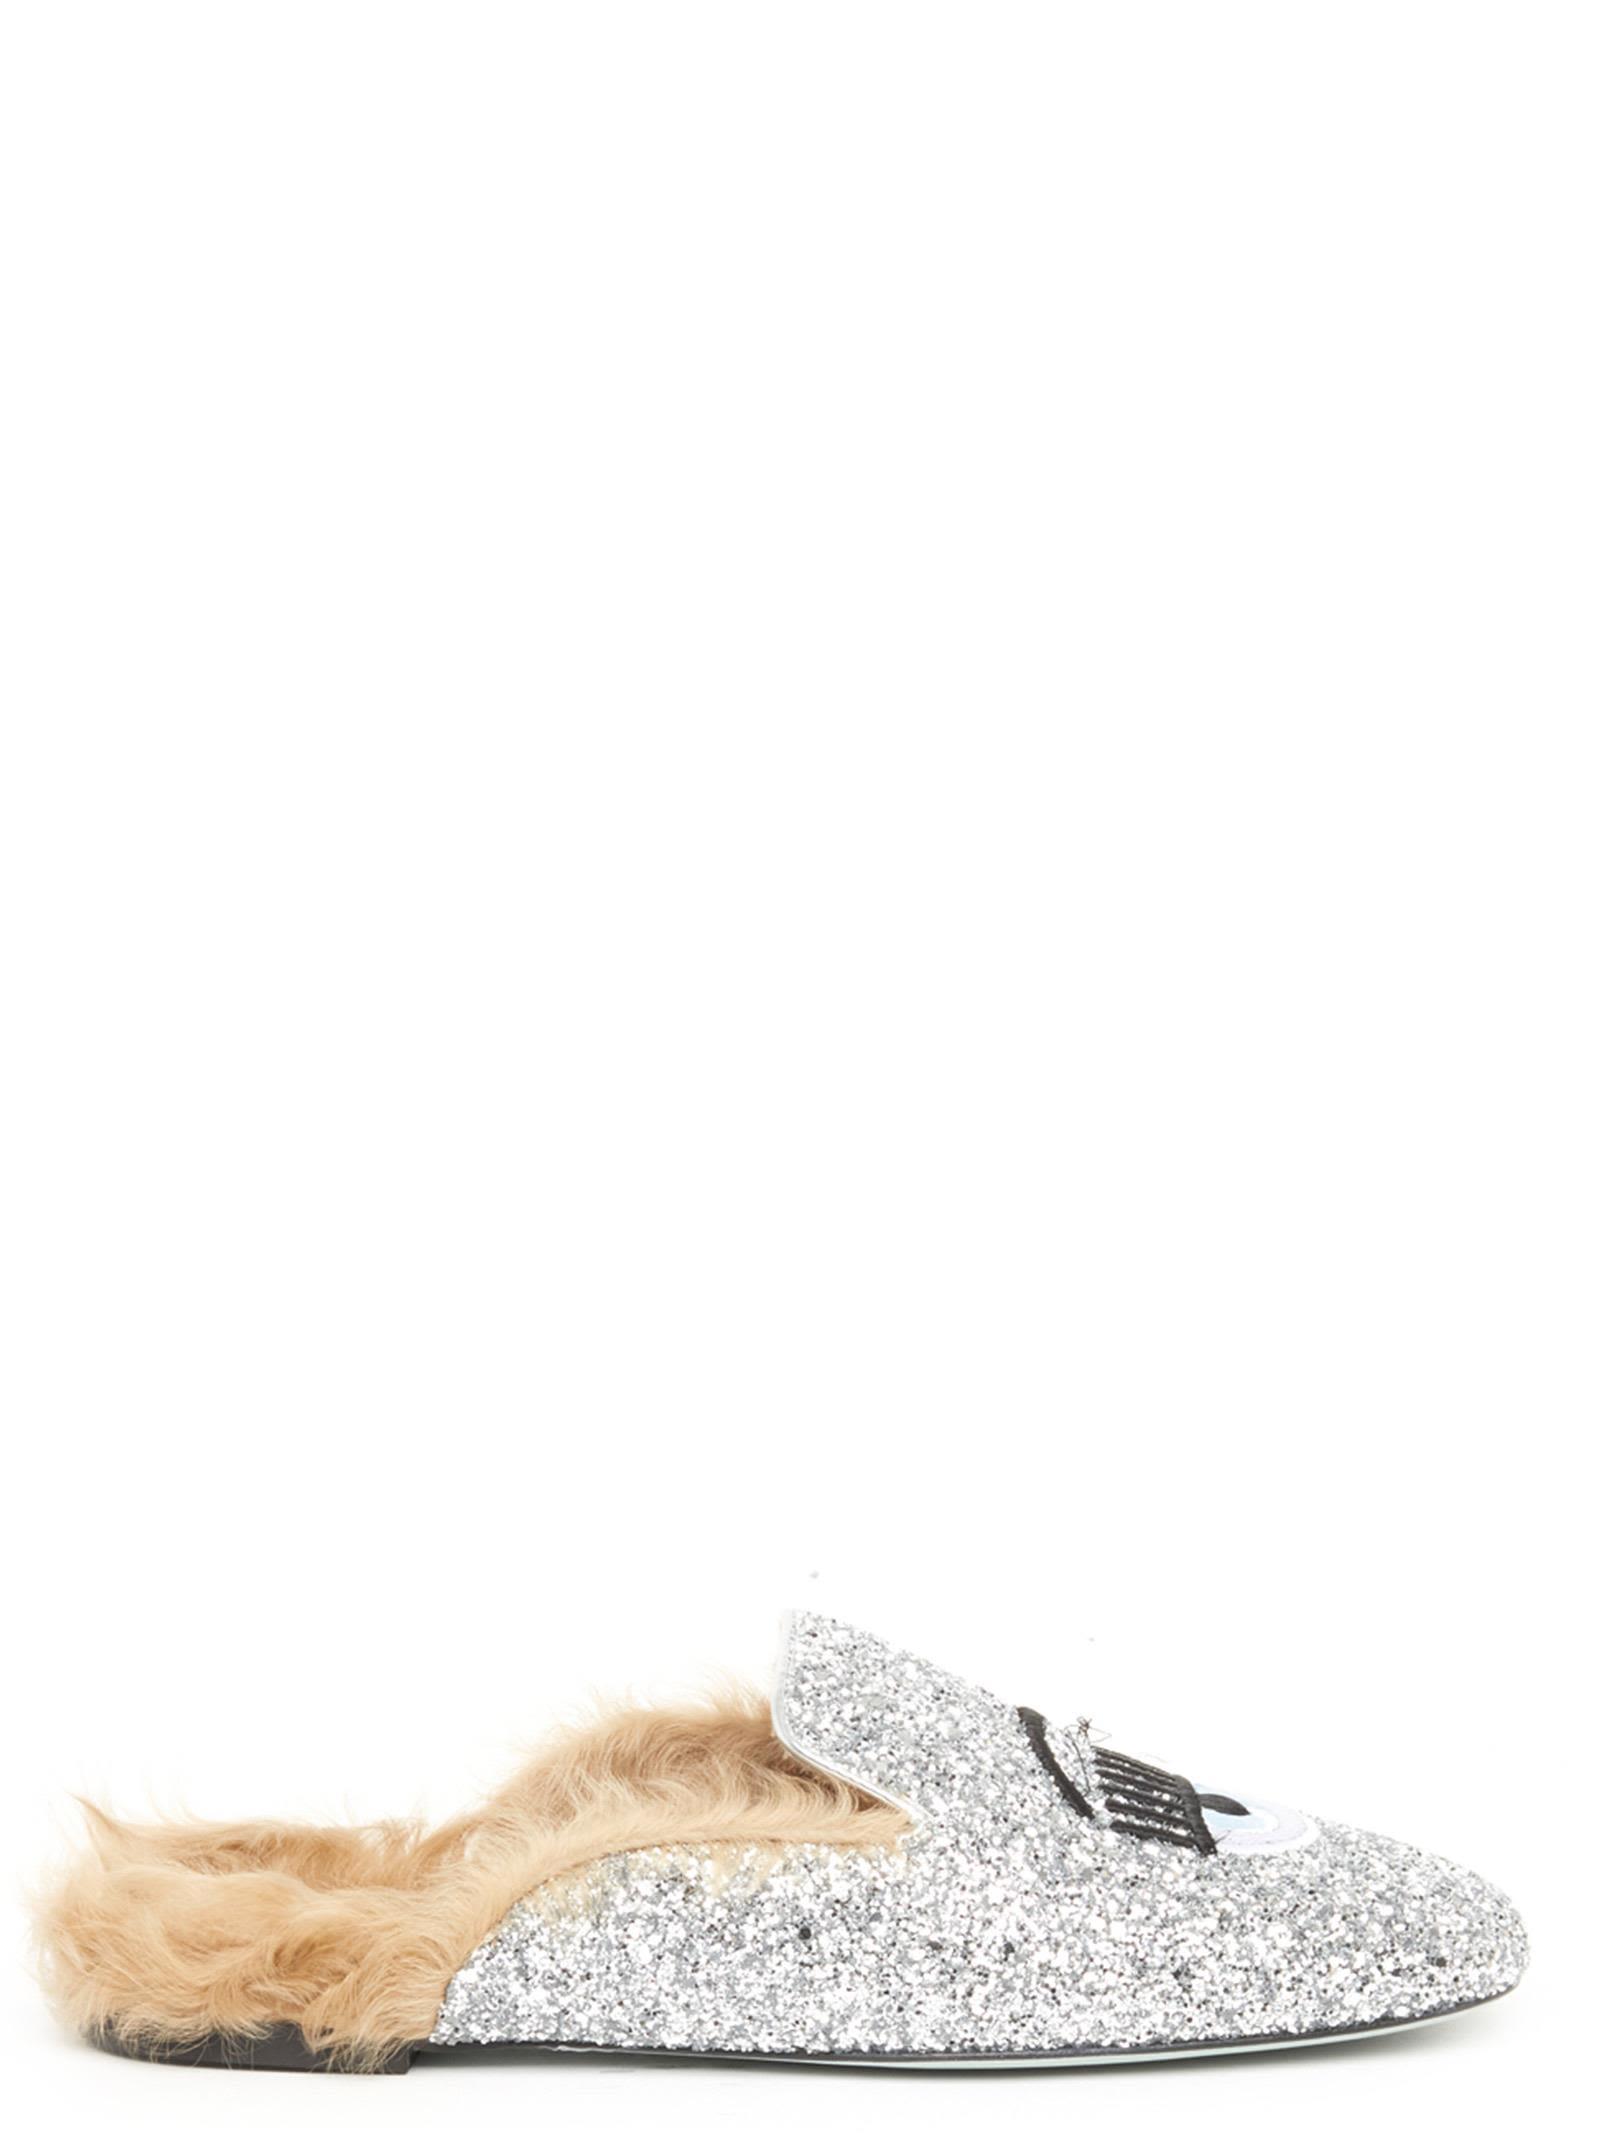 Chiara Ferragni 'flirting' Shoes